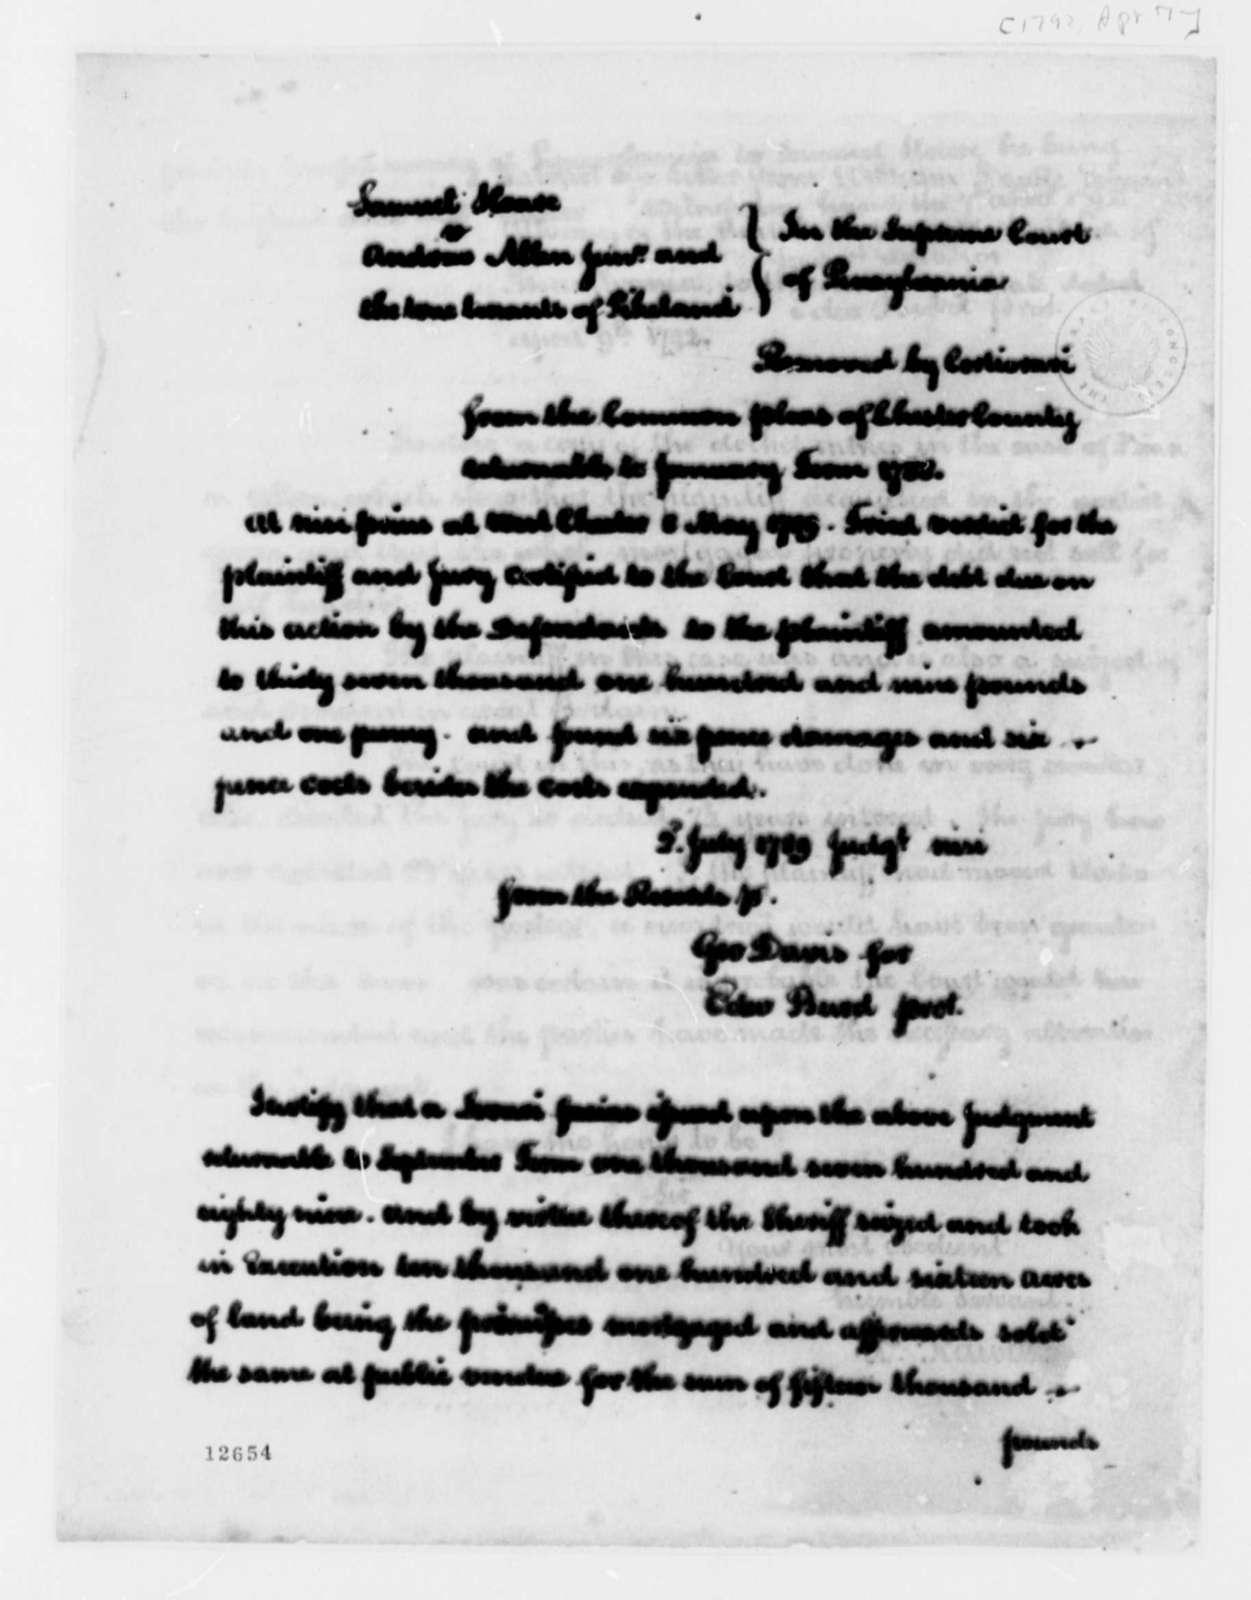 Edward Burd and George Davis to Supreme Court of Pennsylvania, July 2, 1789, Hoare versus Allen